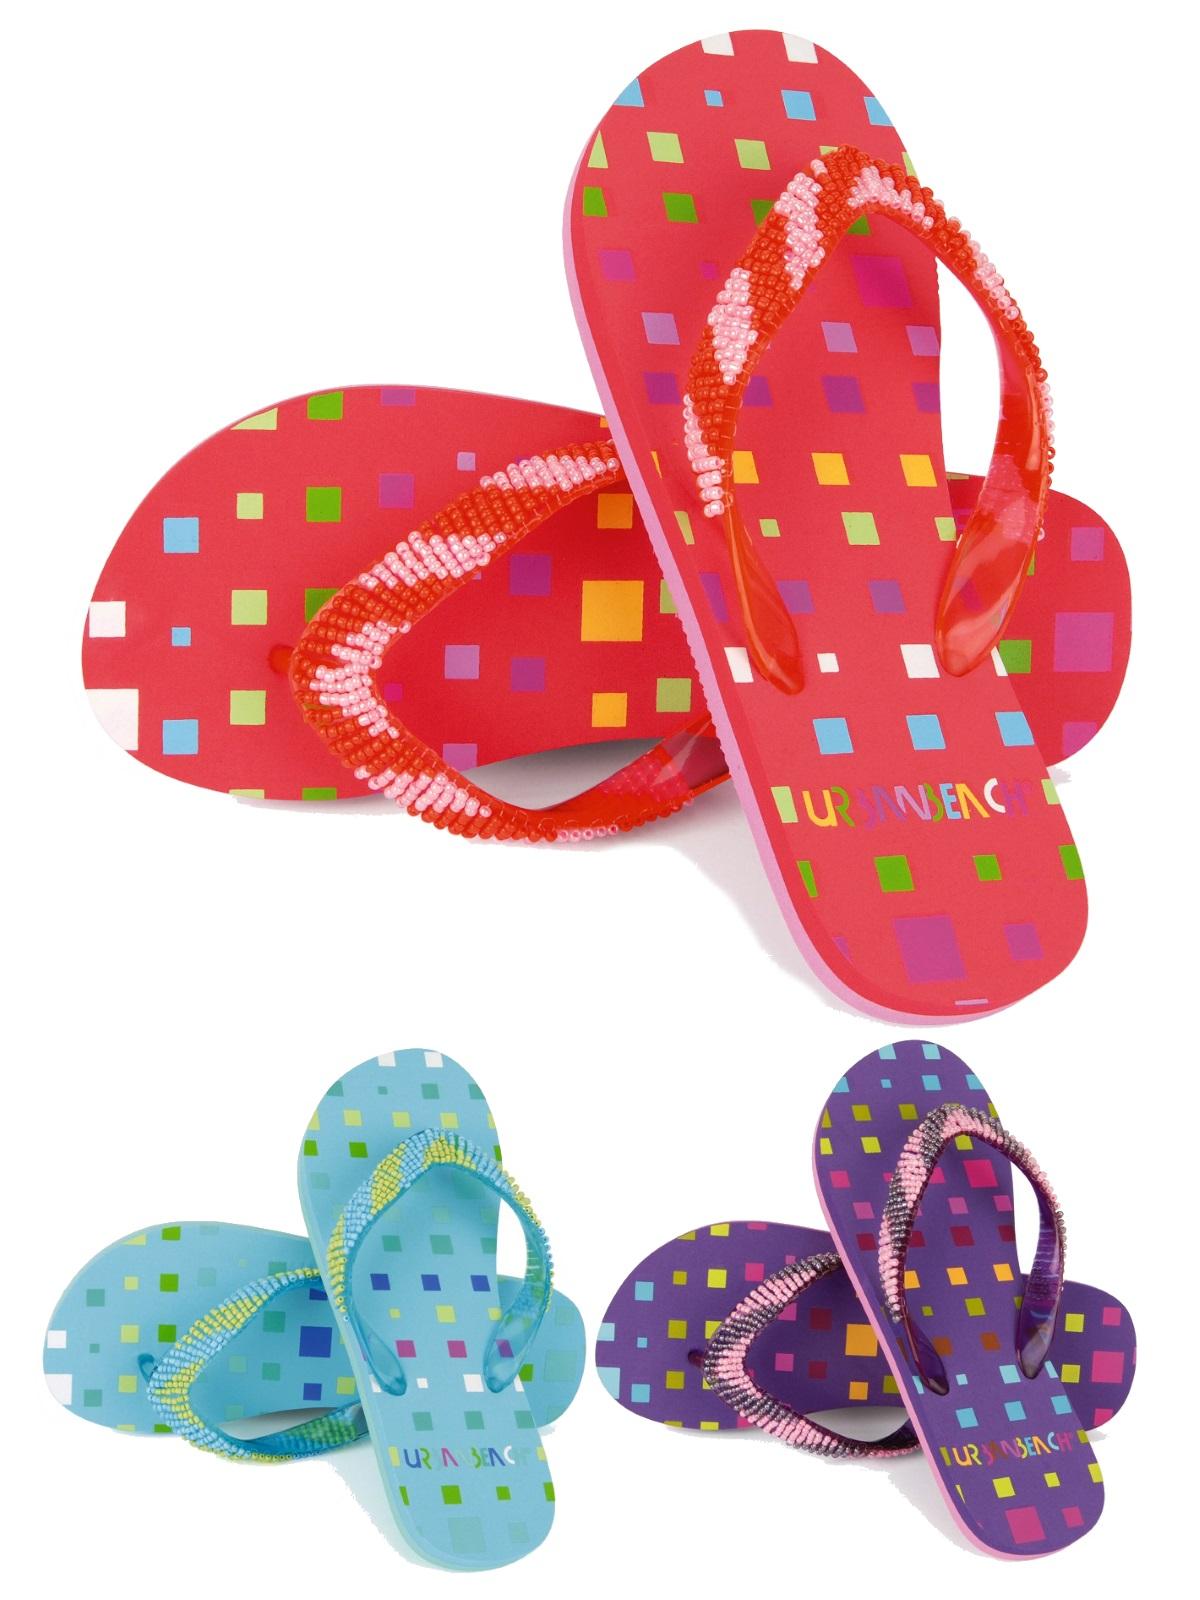 a447c7325 Details about Womens Girls Urban Beach Sandals Flip Flops Toe Posts Kids  Toe Post Summer Shoes